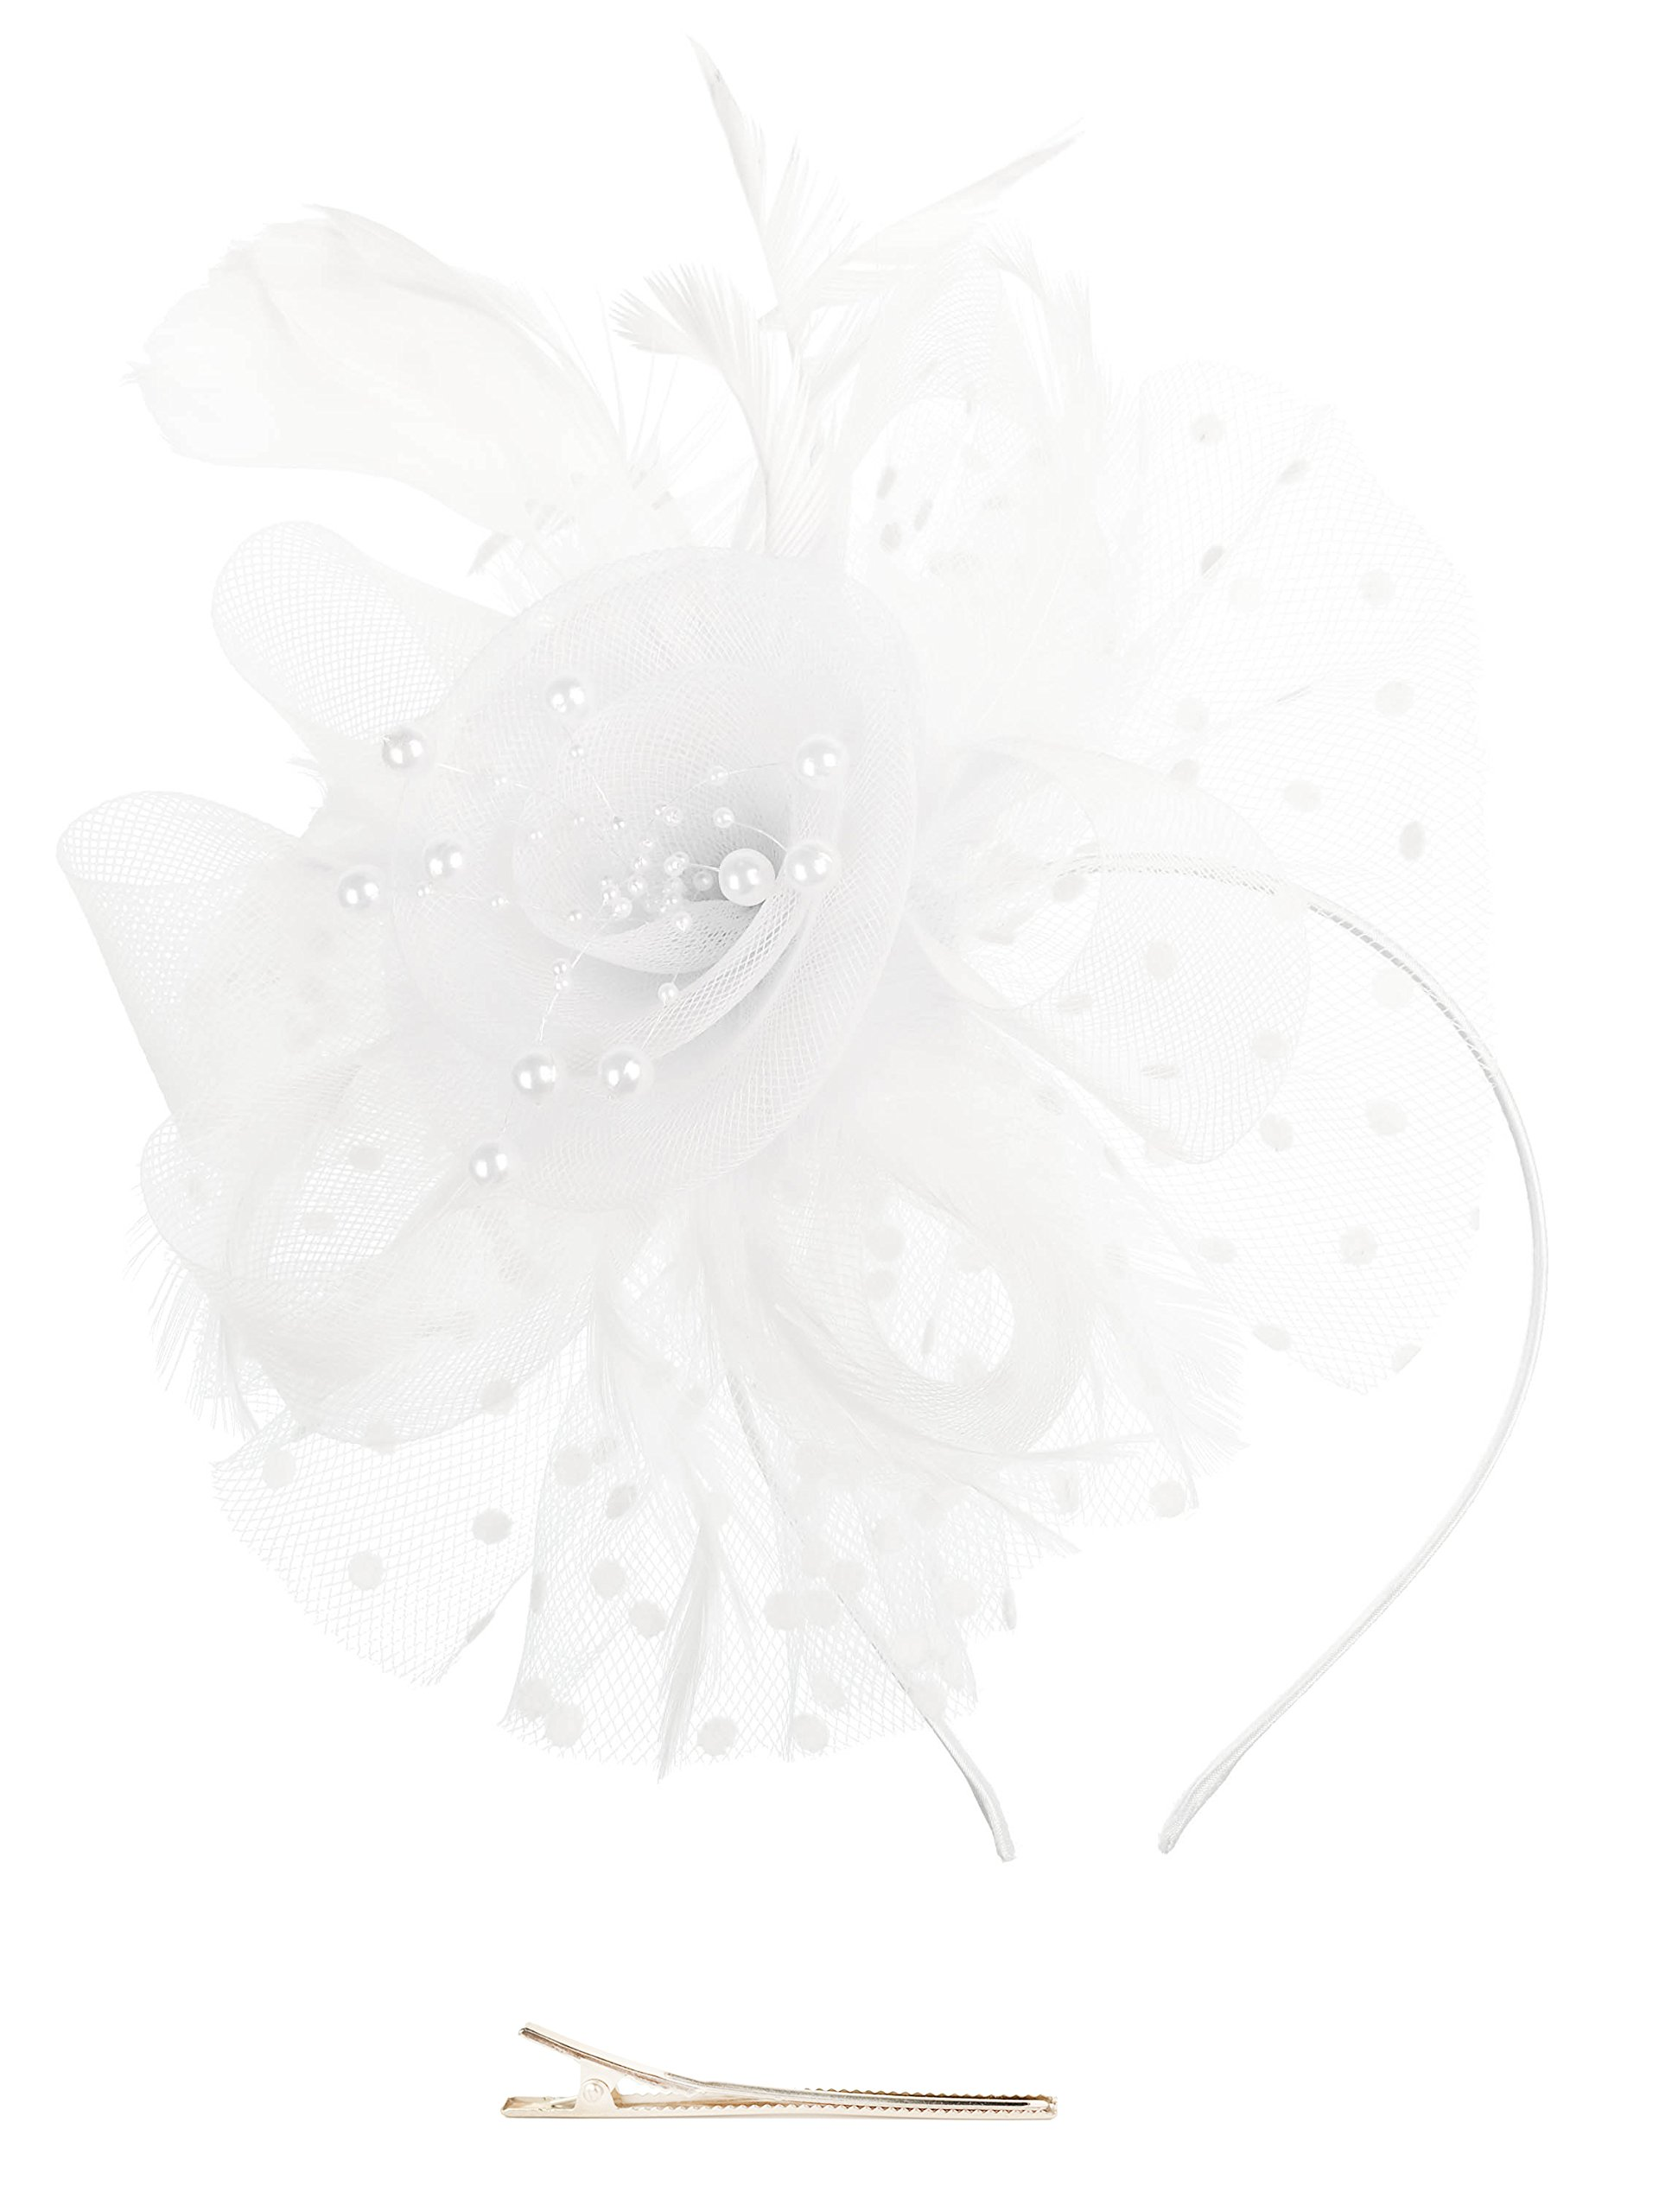 Zivyes Fascinators Hat for Women Tea Party Headband Kentucky Derby Wedding Cocktail Flower Mesh Feathers Hair Clip